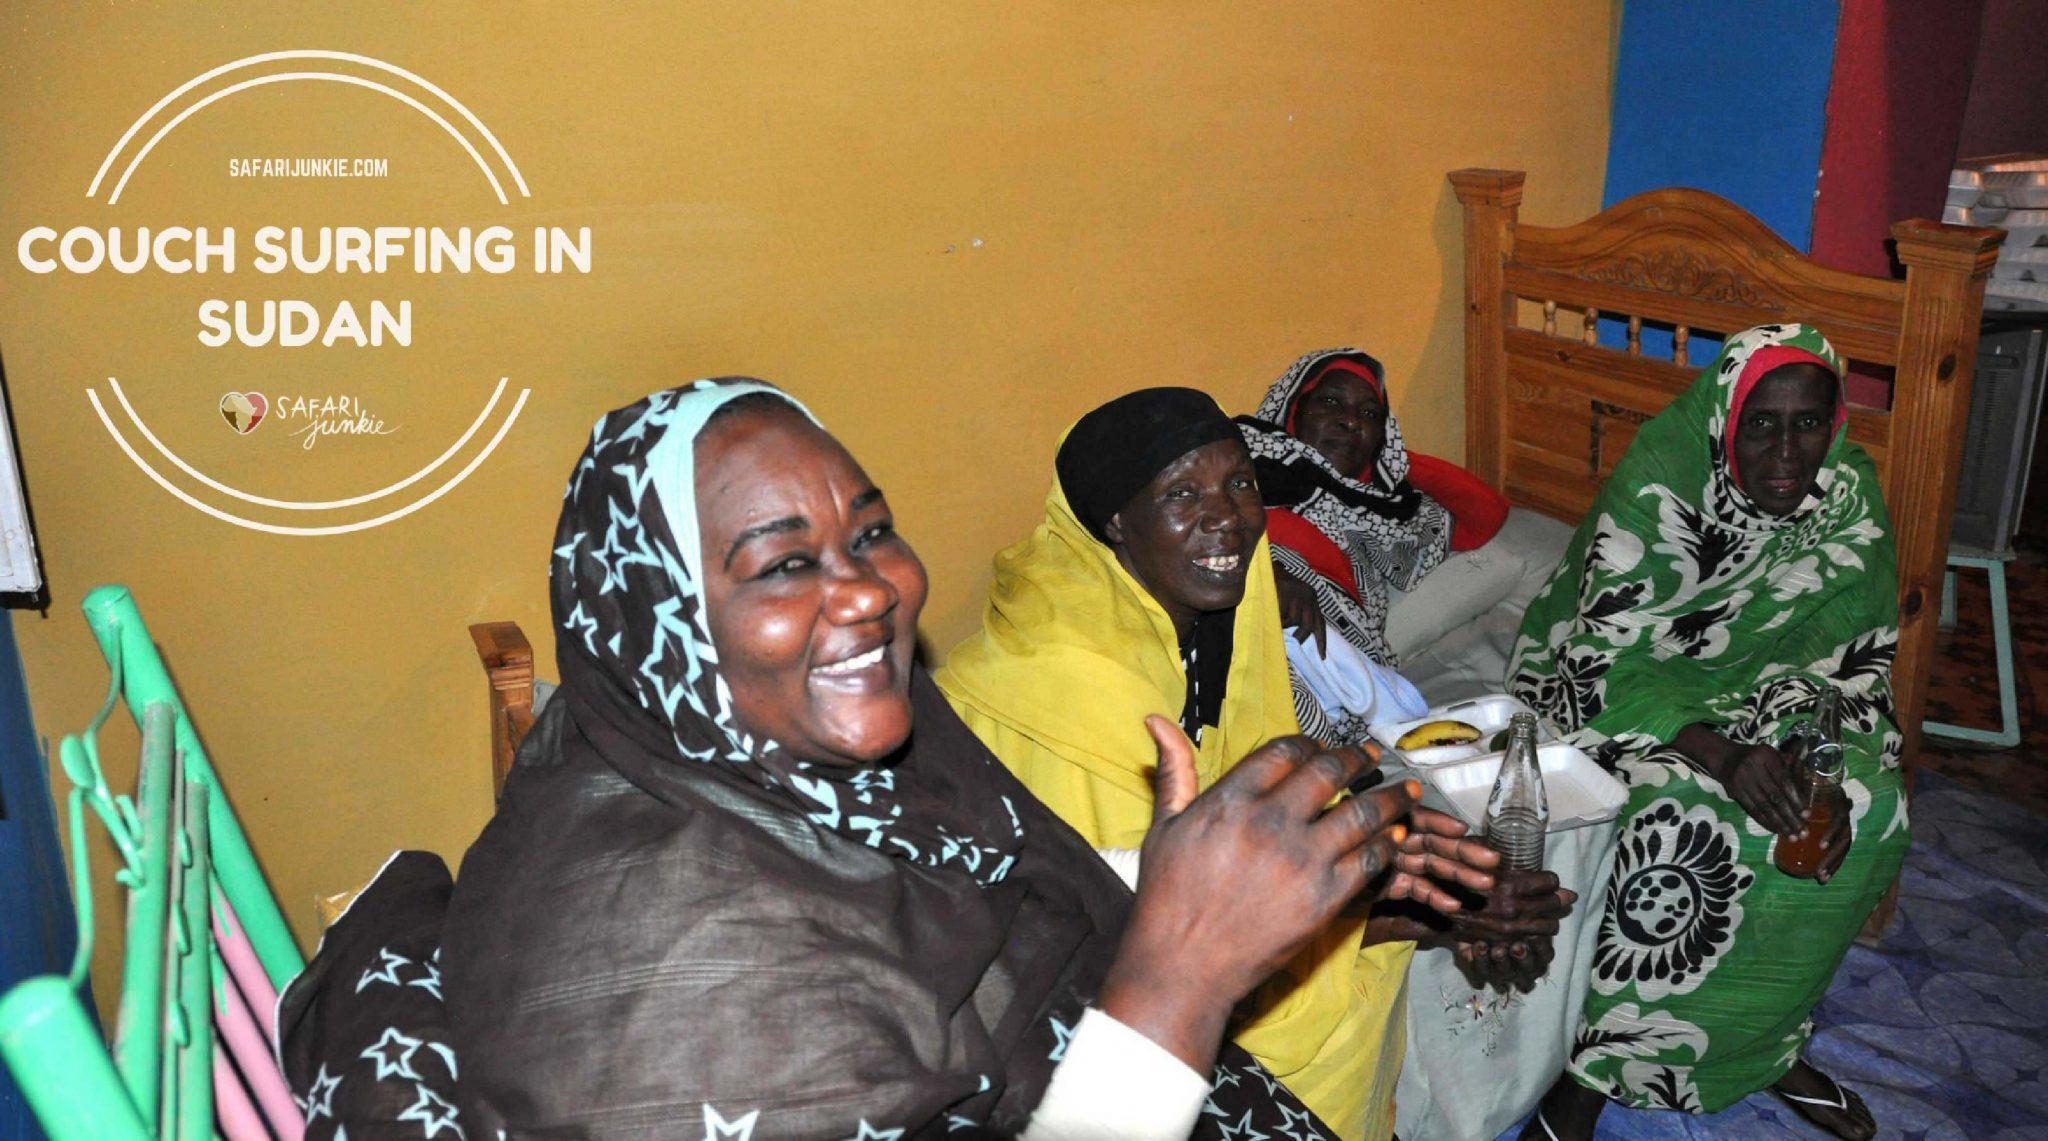 Couchsurfing-in-Khartoum-Sudan